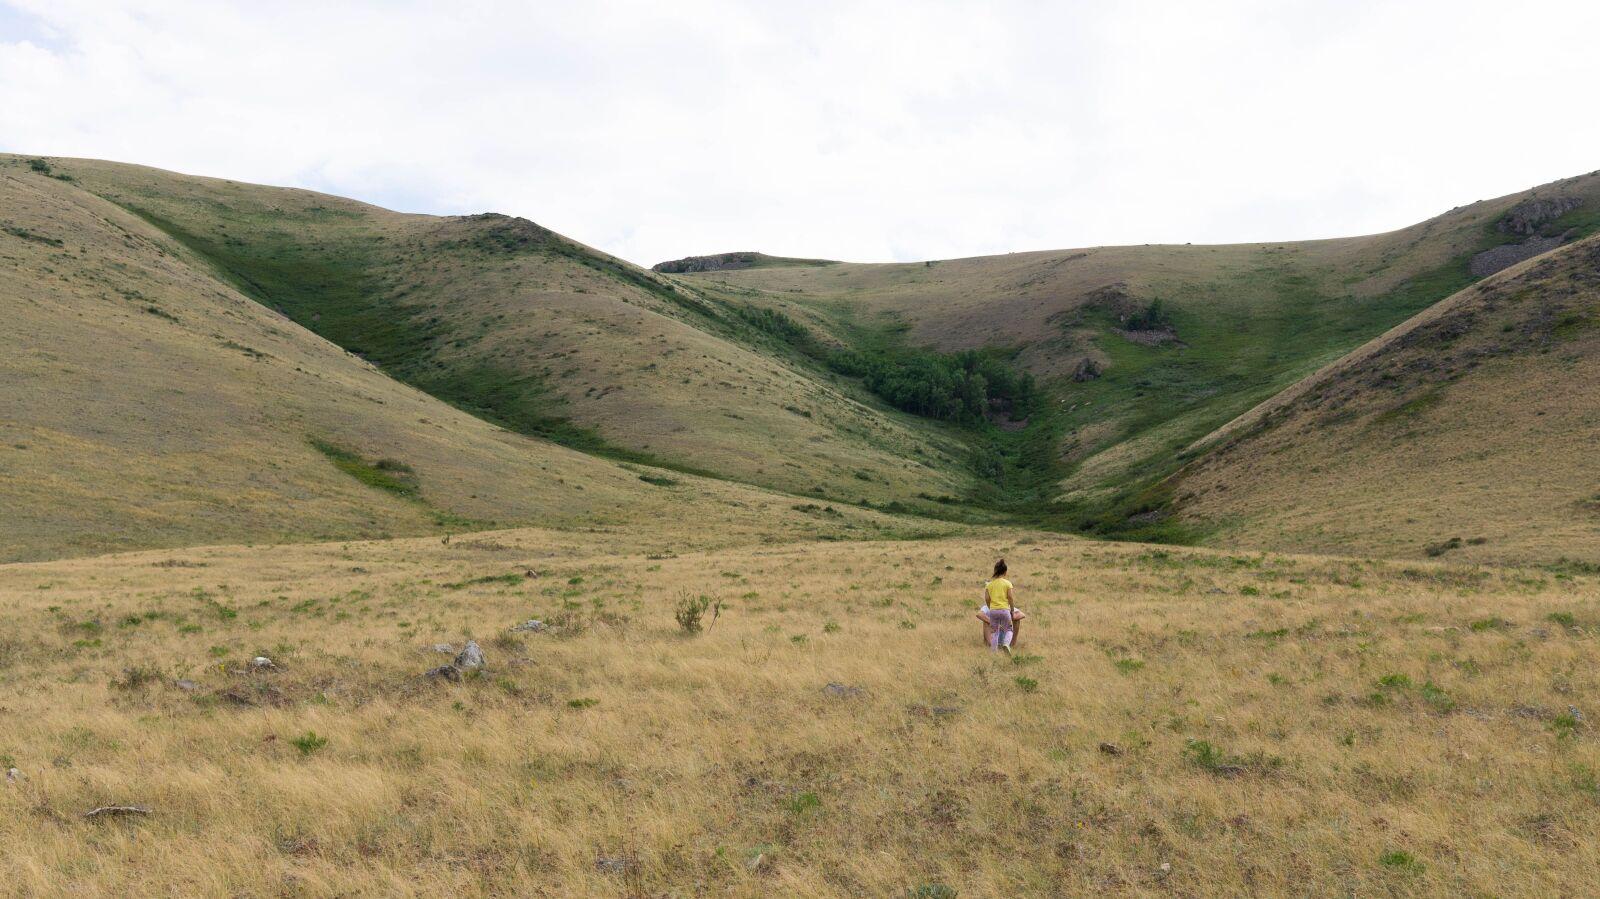 steppe, landscape, semeynogo